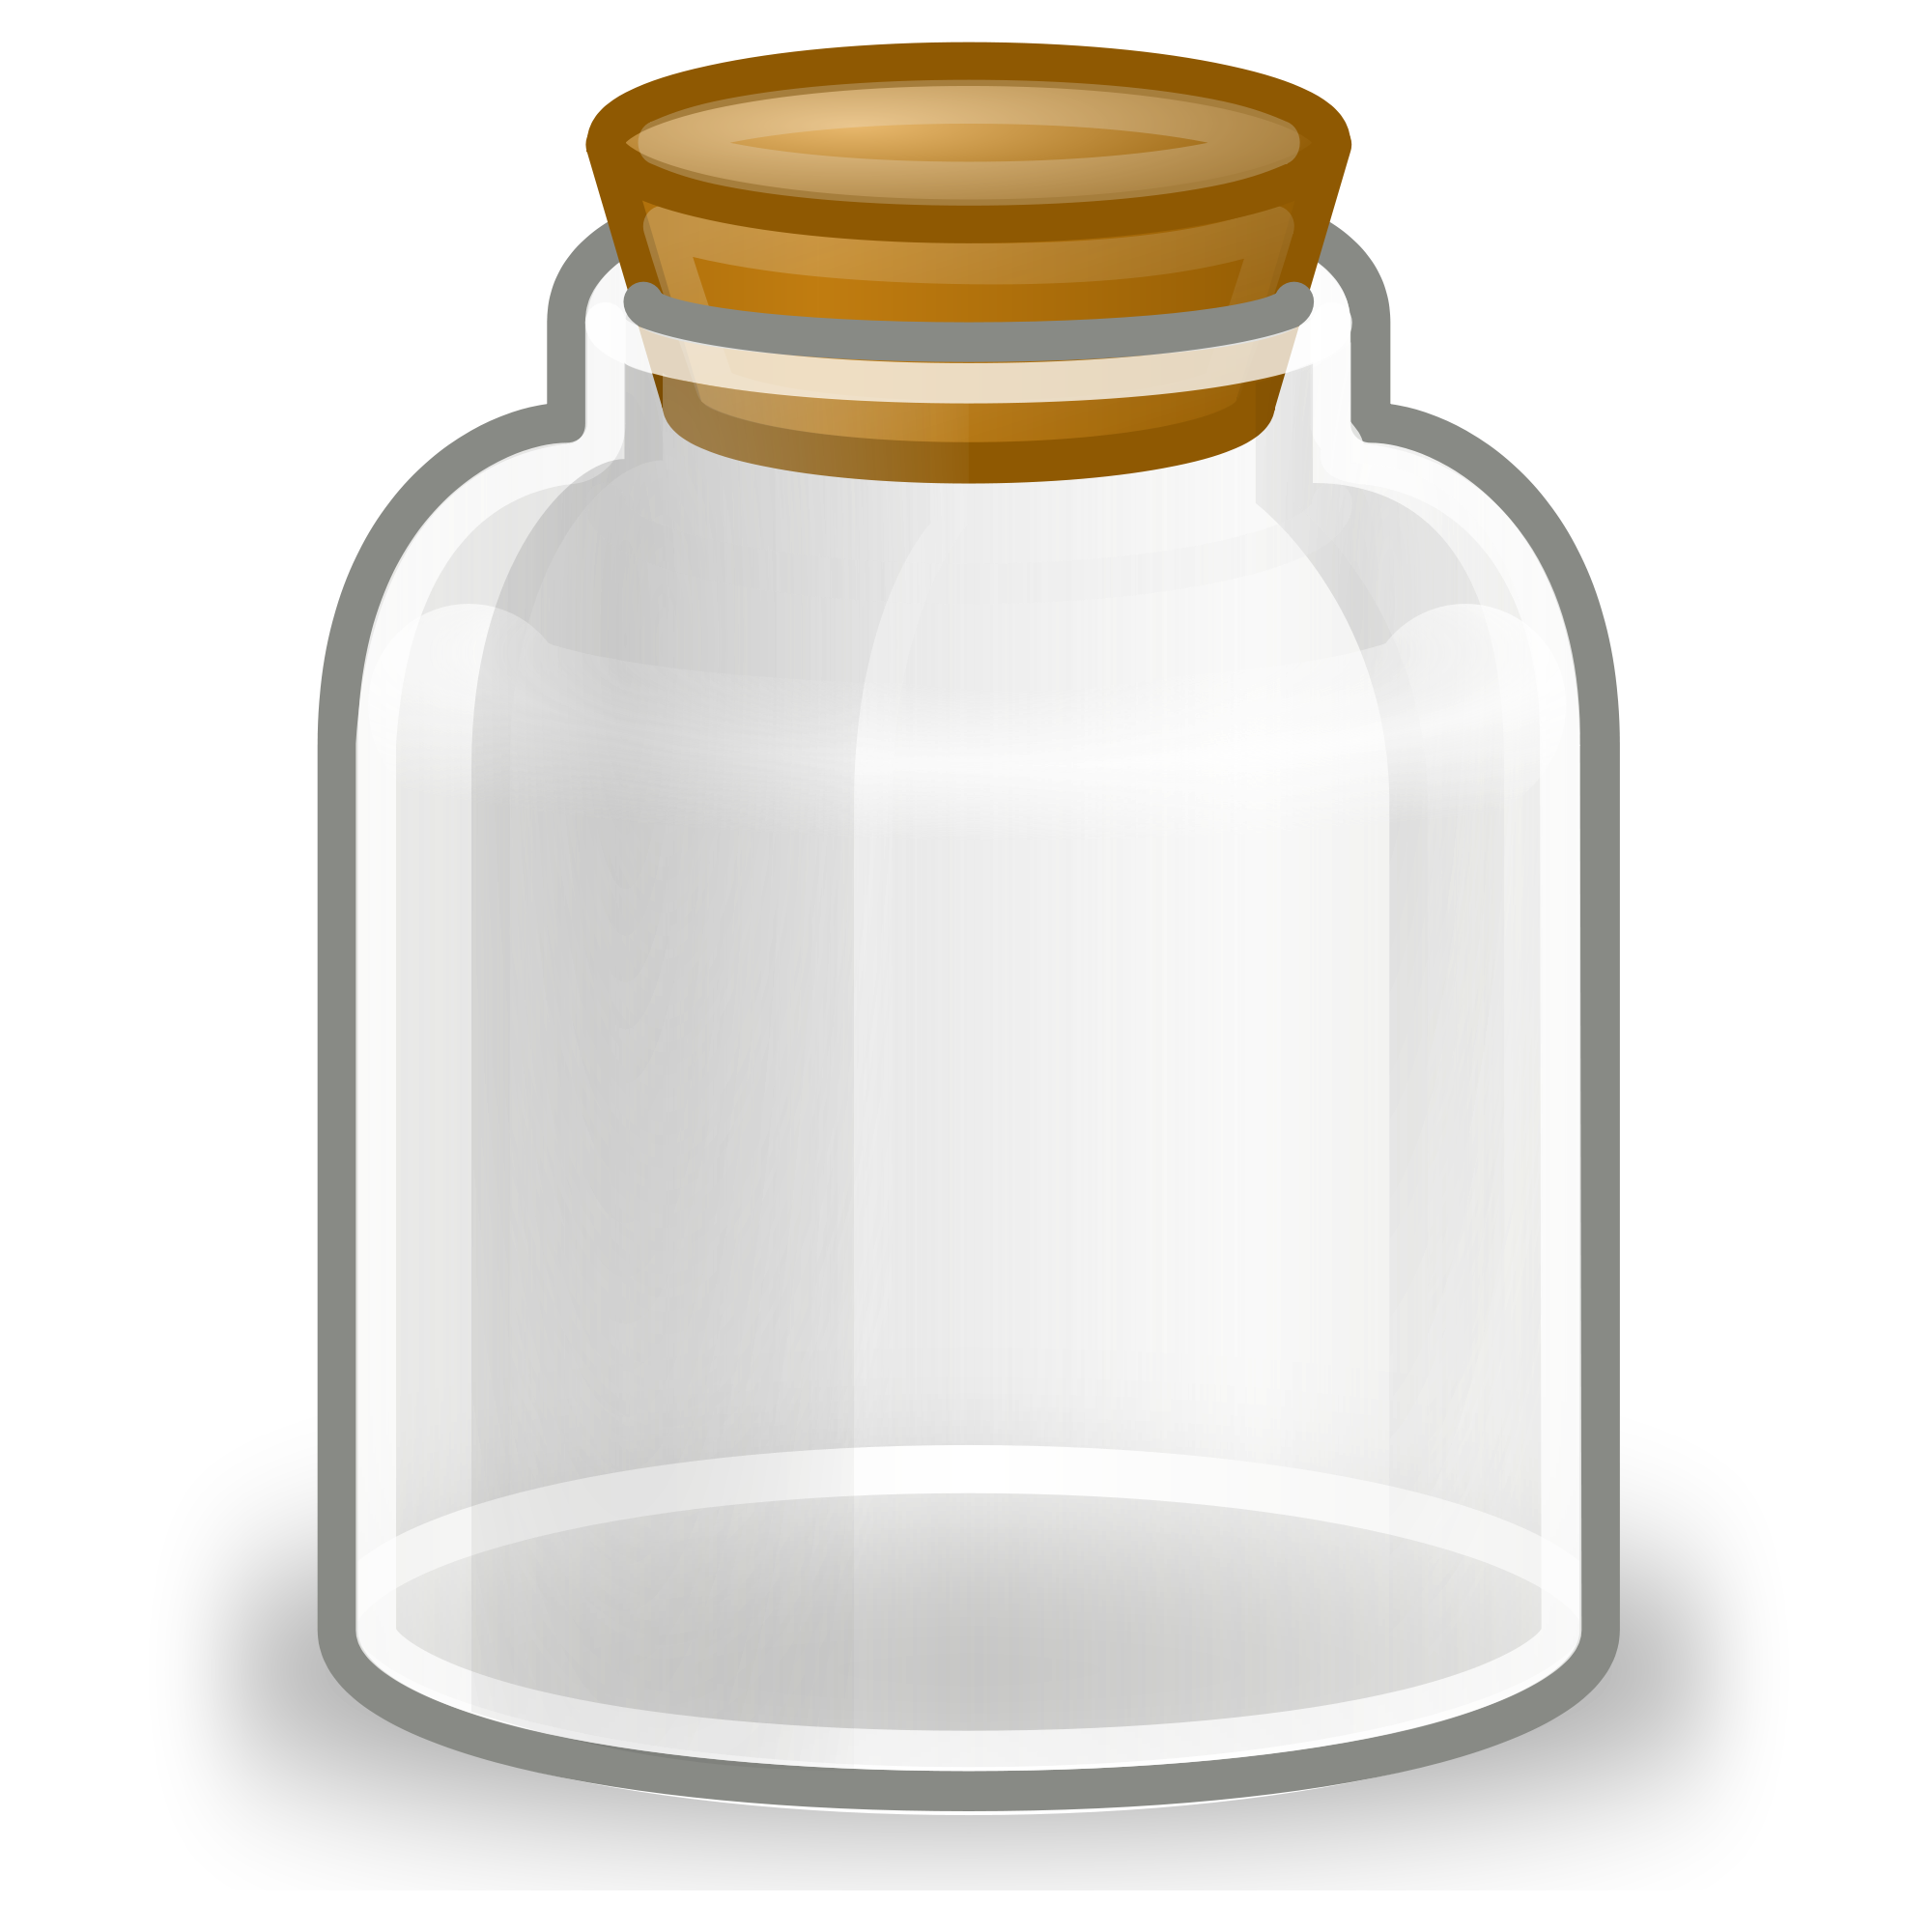 Jar PNG - 27939